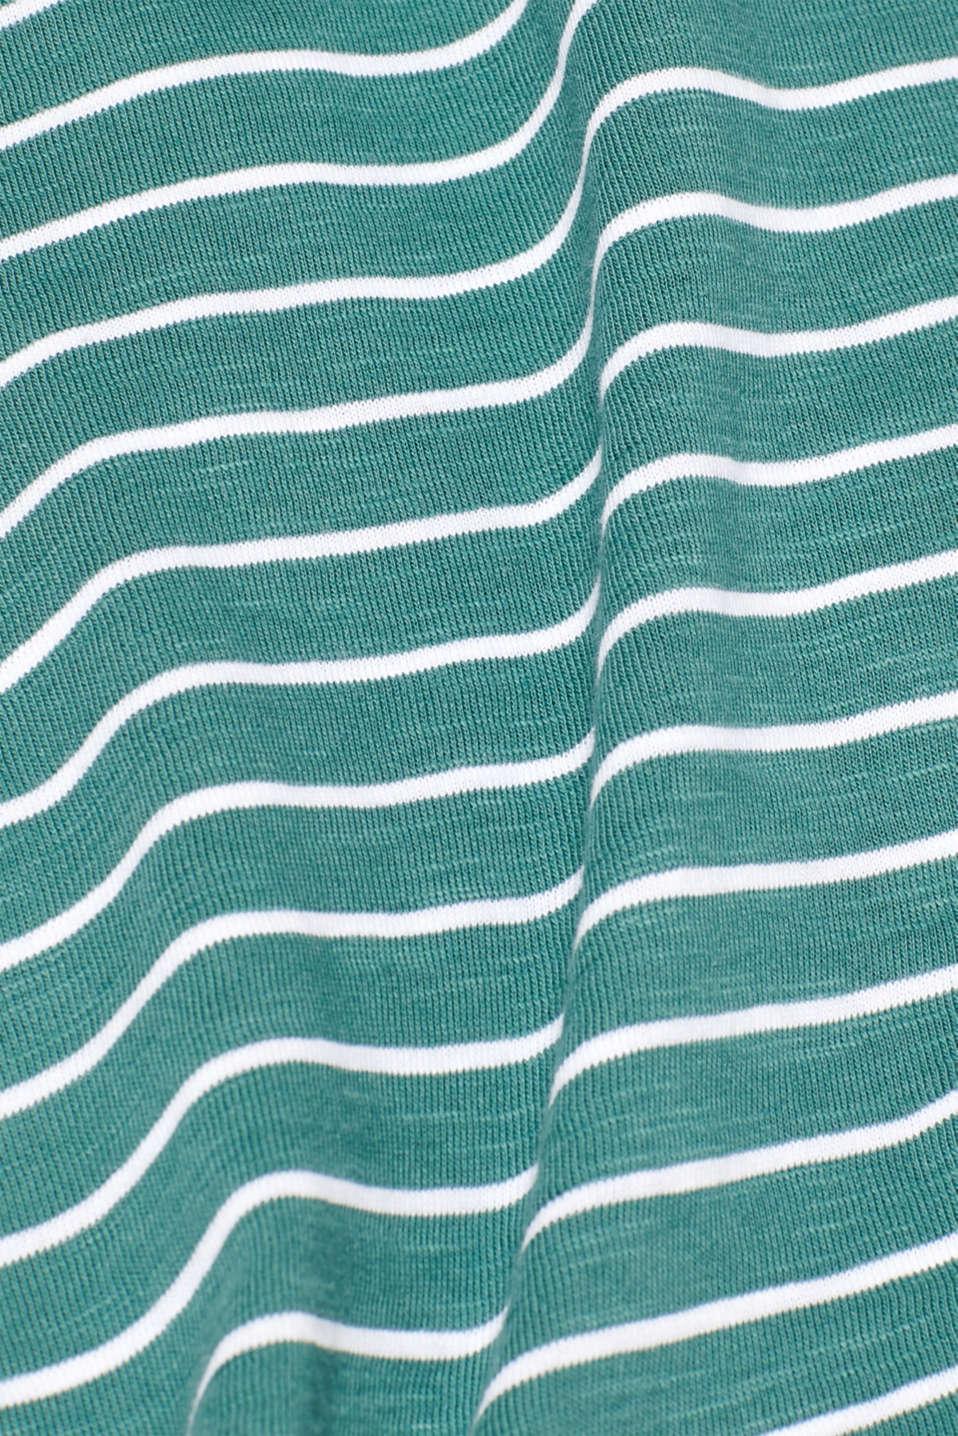 Jersey longsleeve top made of slub jersey, DUSTY GREEN, detail image number 4